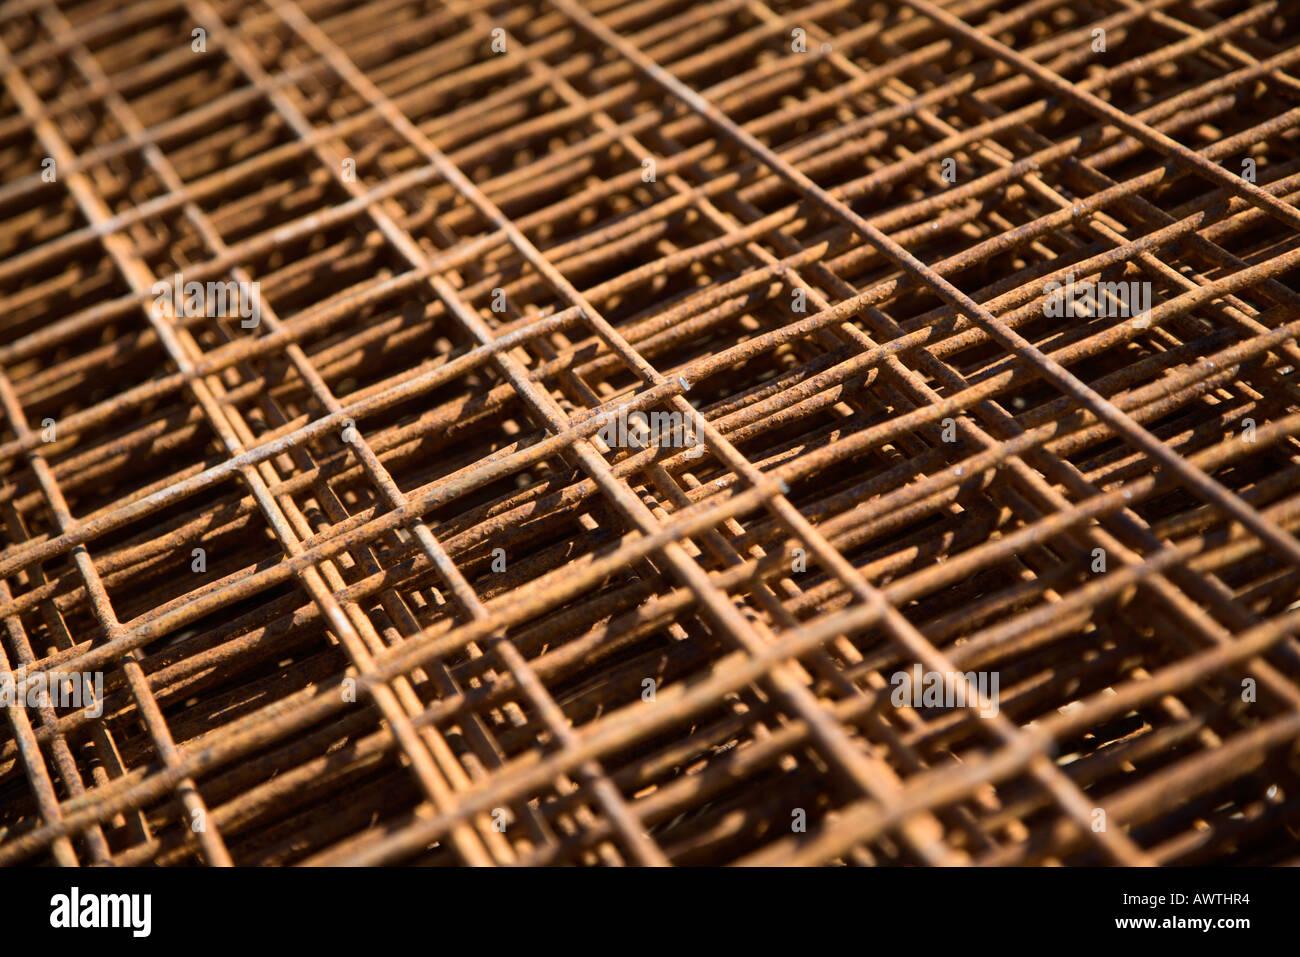 Rusty steel mesh forms rectangular patterns - Stock Image